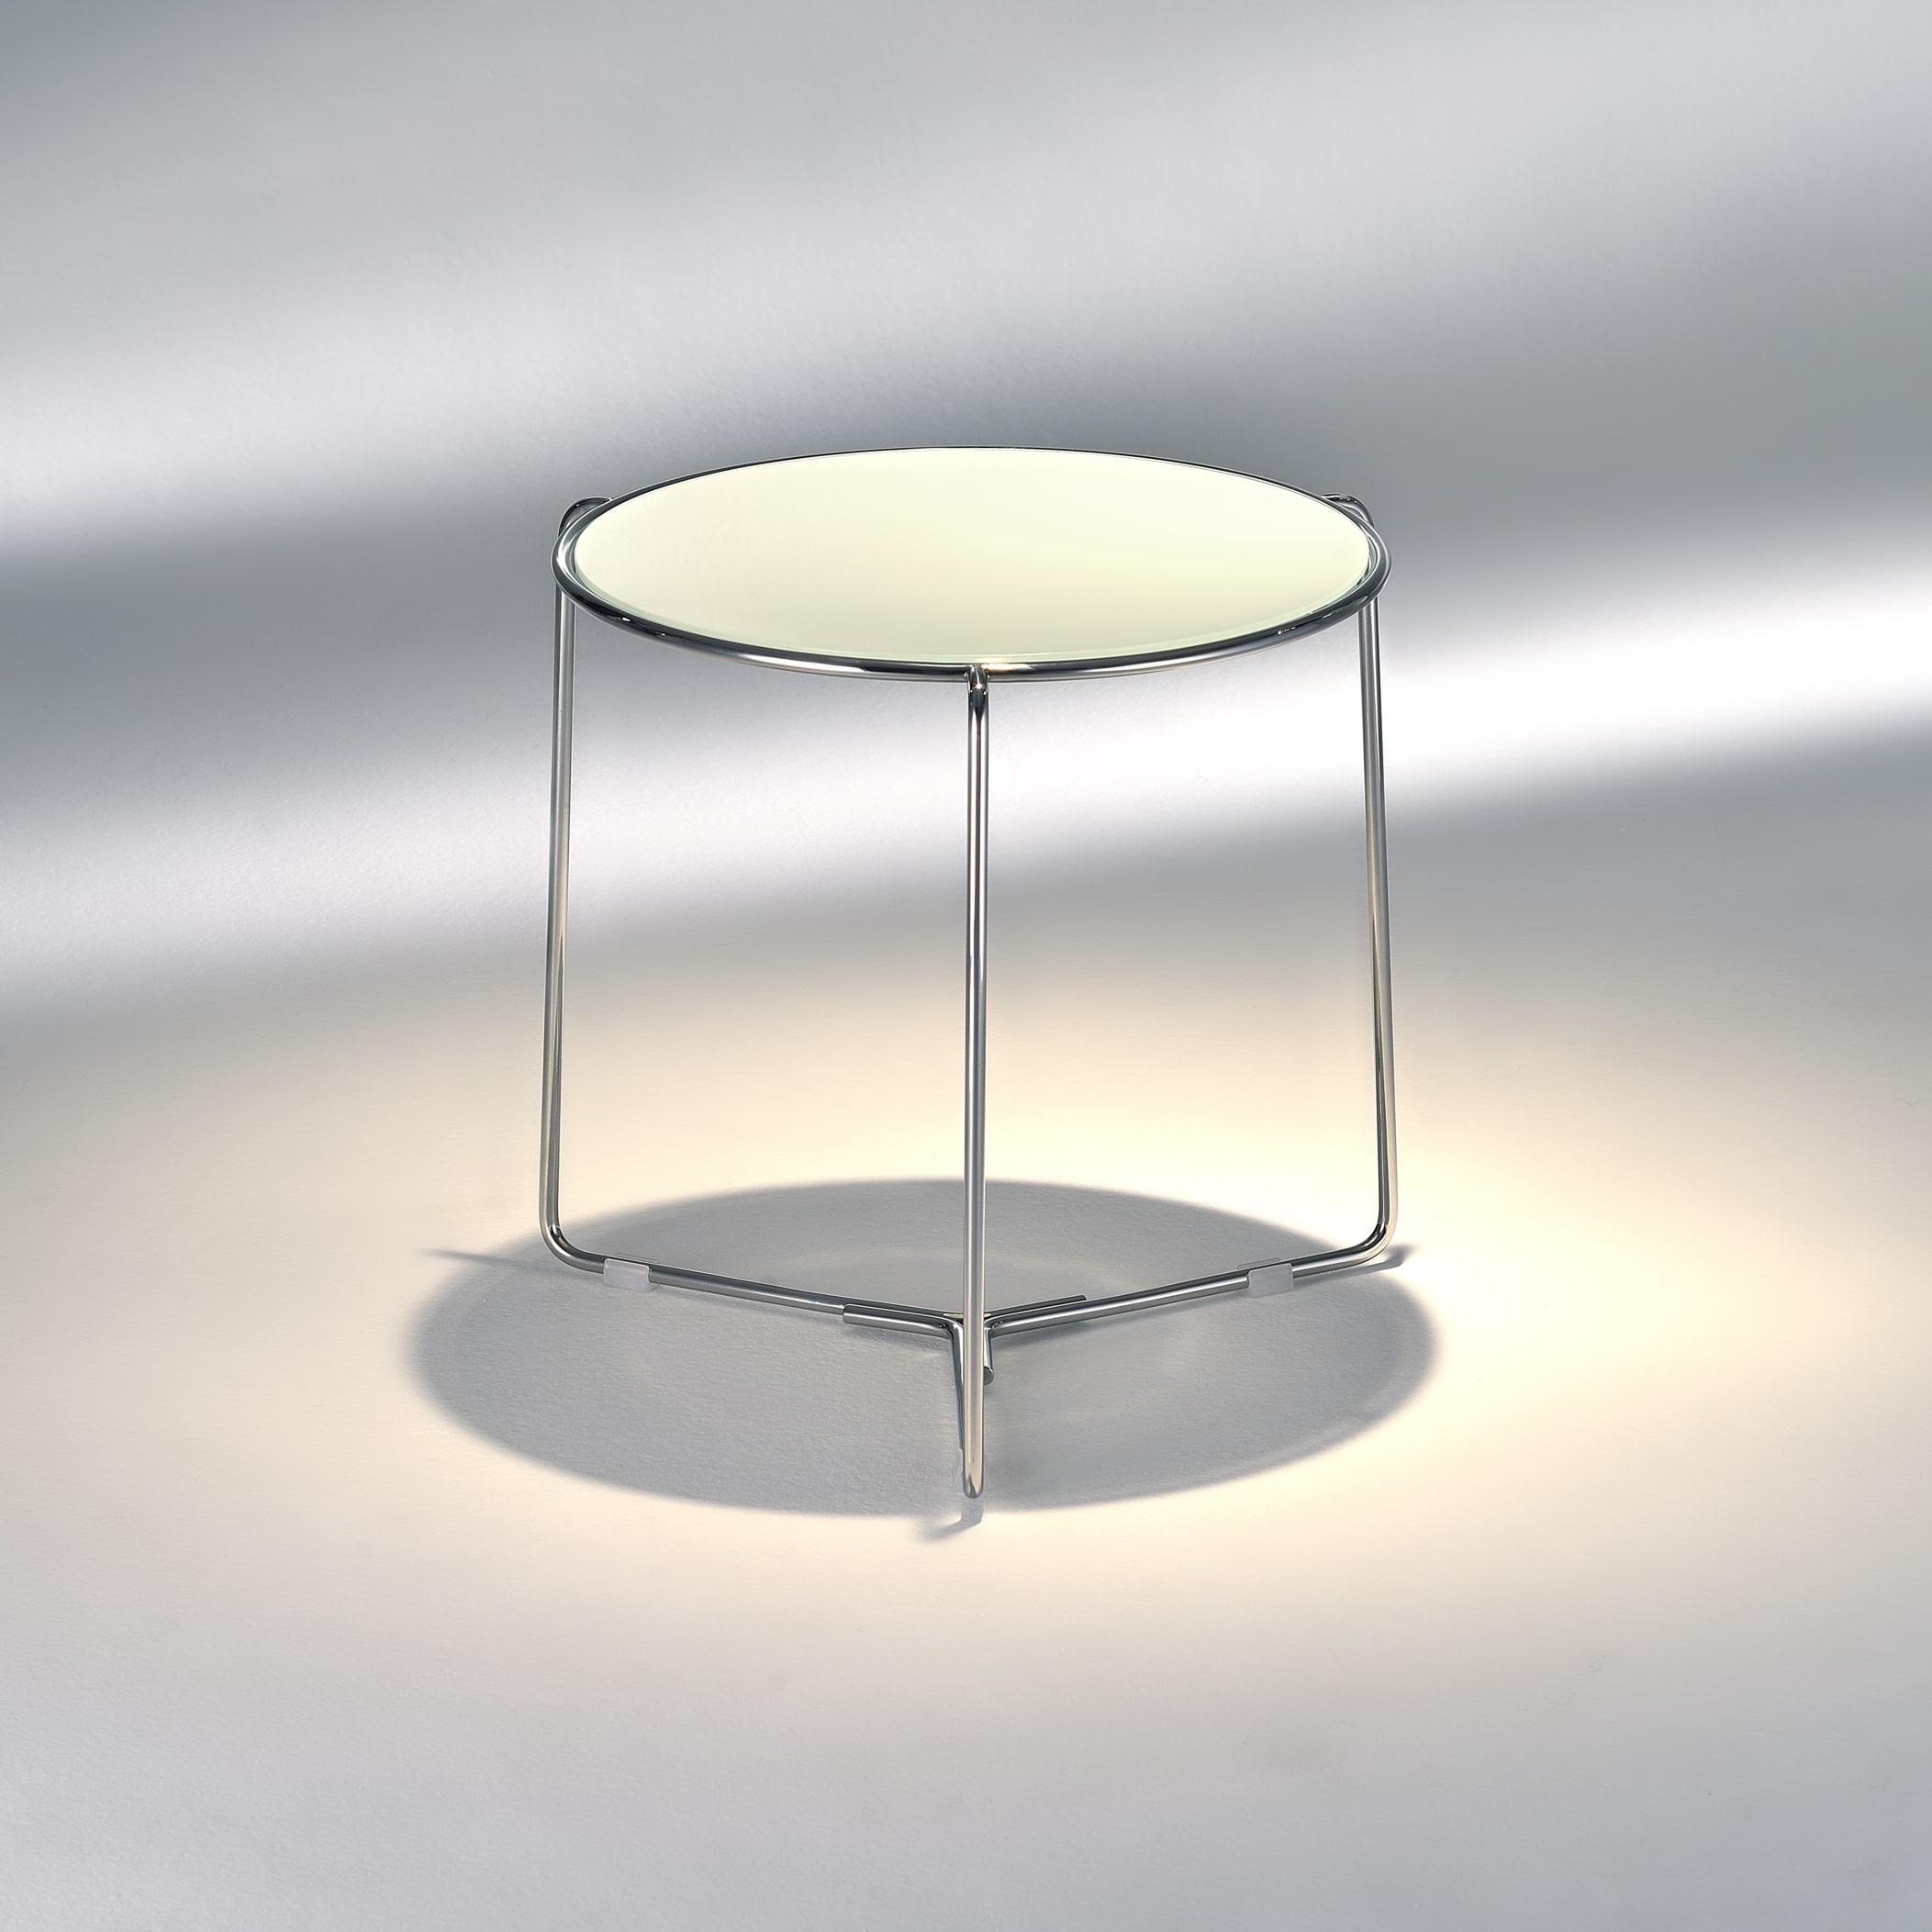 Mesa Lateral Tavoline Estrutura Aço Inox e Tampo Vidro Cristal Design by Studio Mais